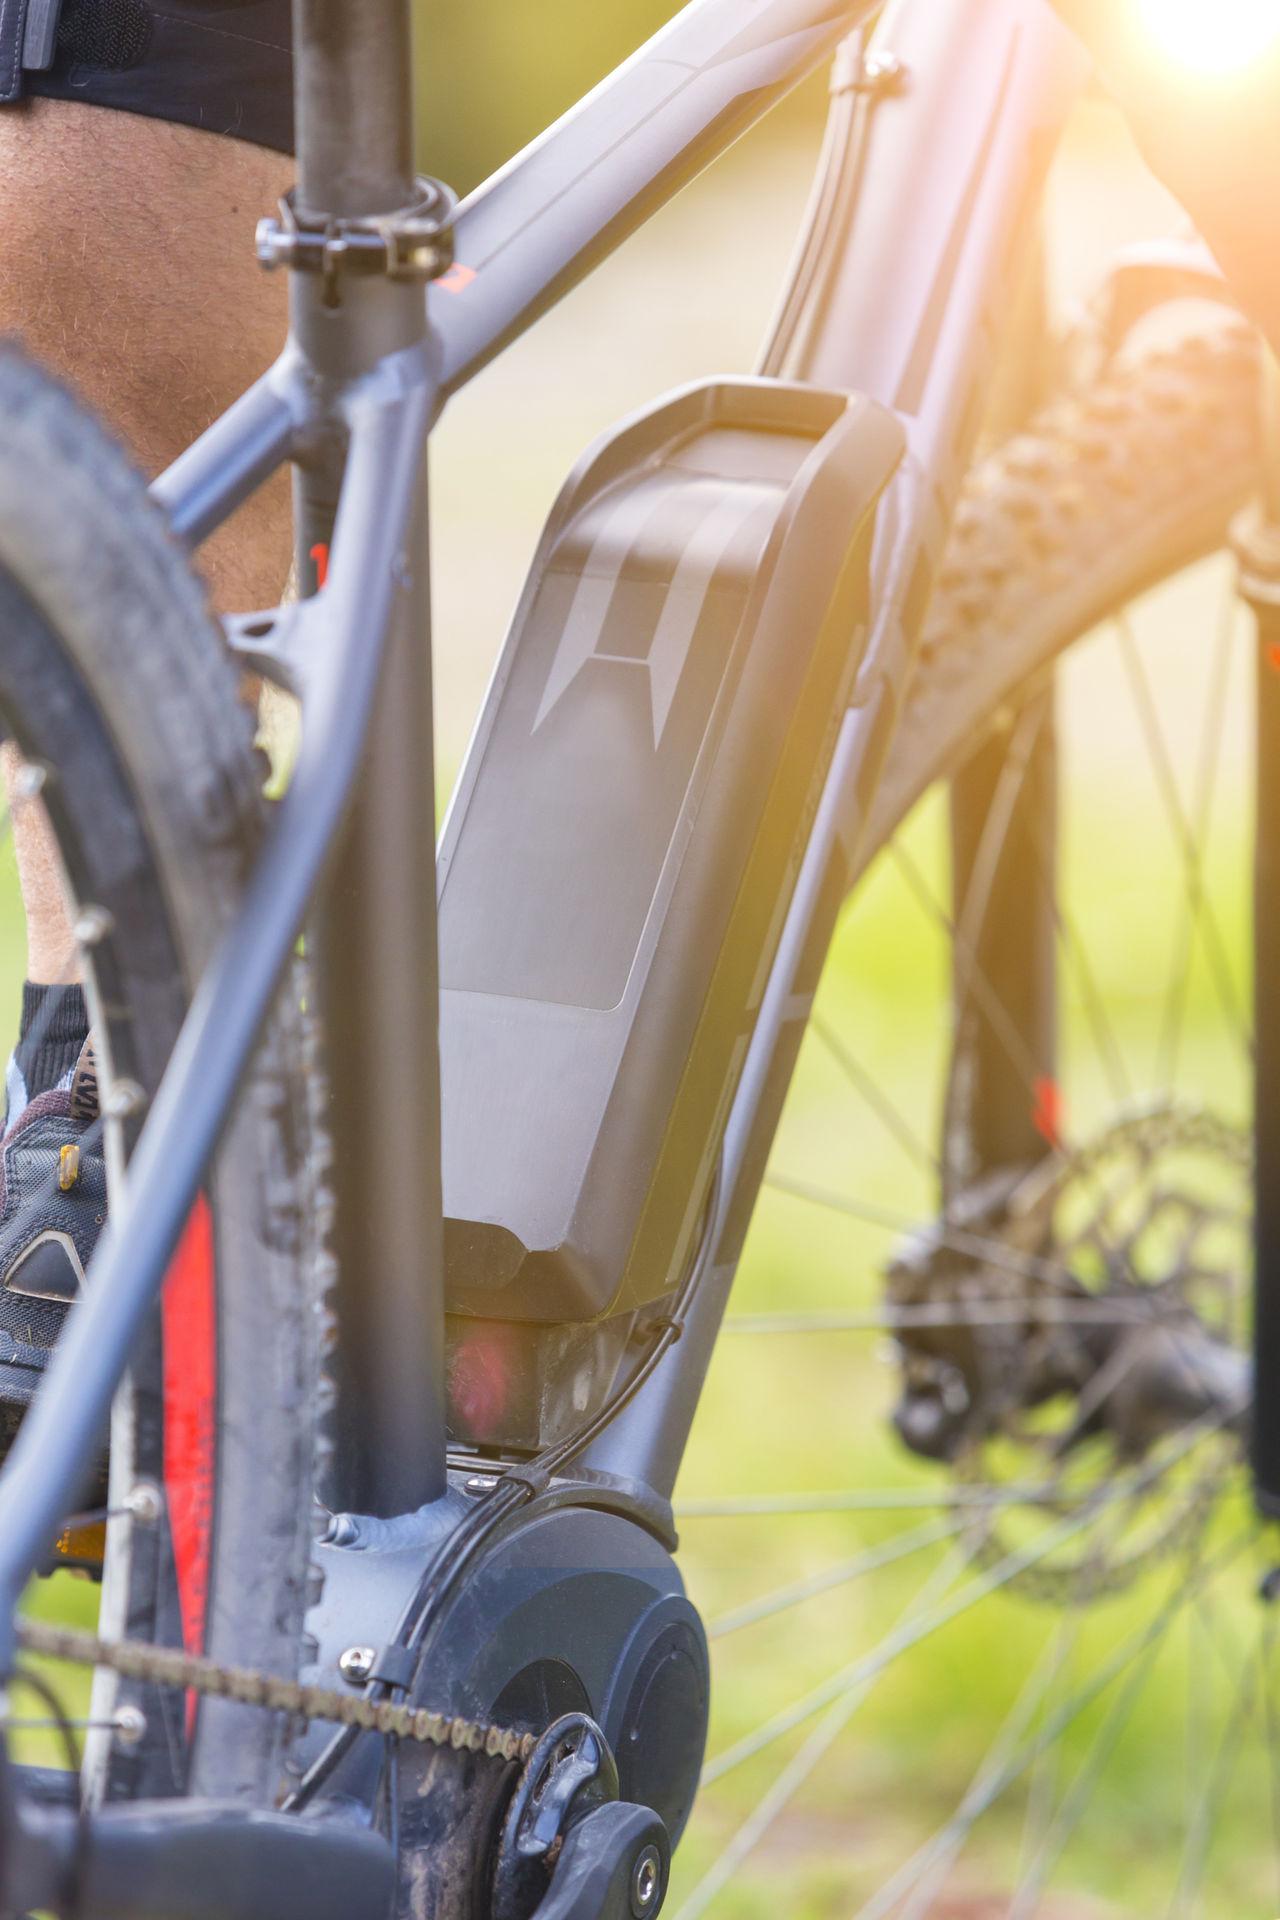 Close up of modern e-mountainbike Battery Bicycle Bike Biker Charge Charging Close-up E-bike E-mountain Ebike Electric Electric Bicycle Electric Bike Fitness Freeride Man Modern Motor Mountainbike Outdoors Power Recreation  Riding Technology Transportation